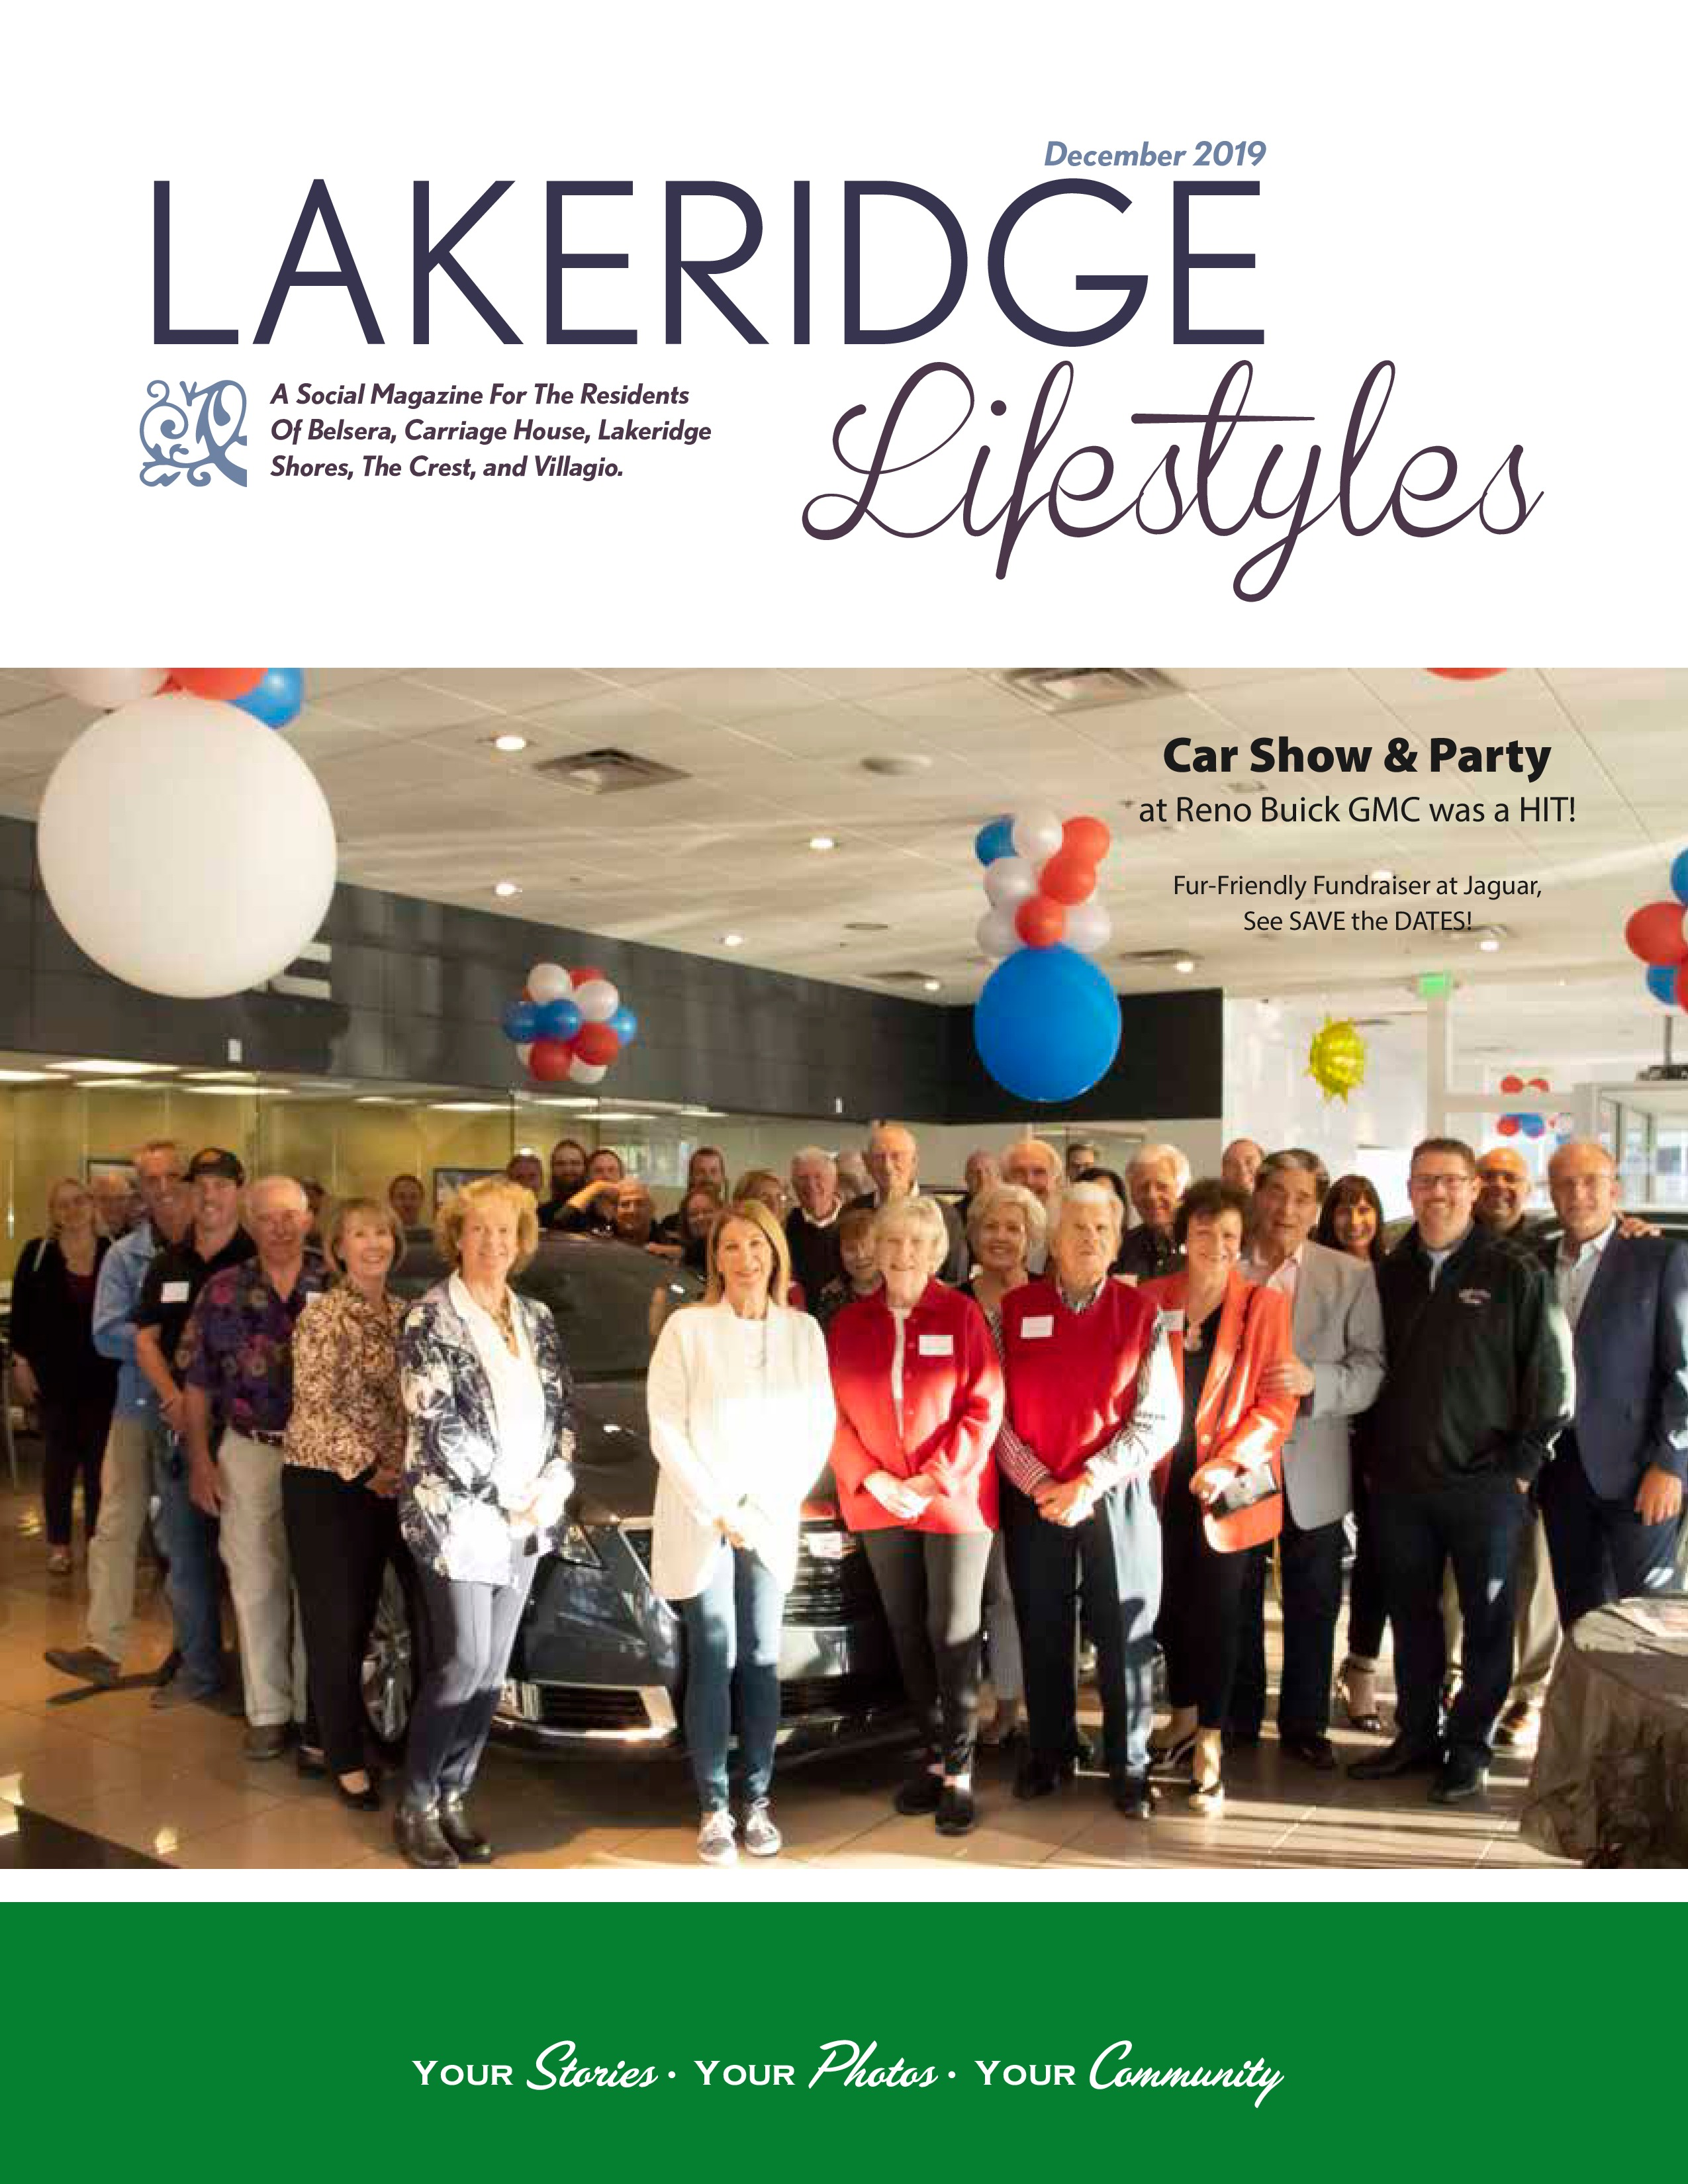 Dec 2019 lakeridge lifestyles page 1